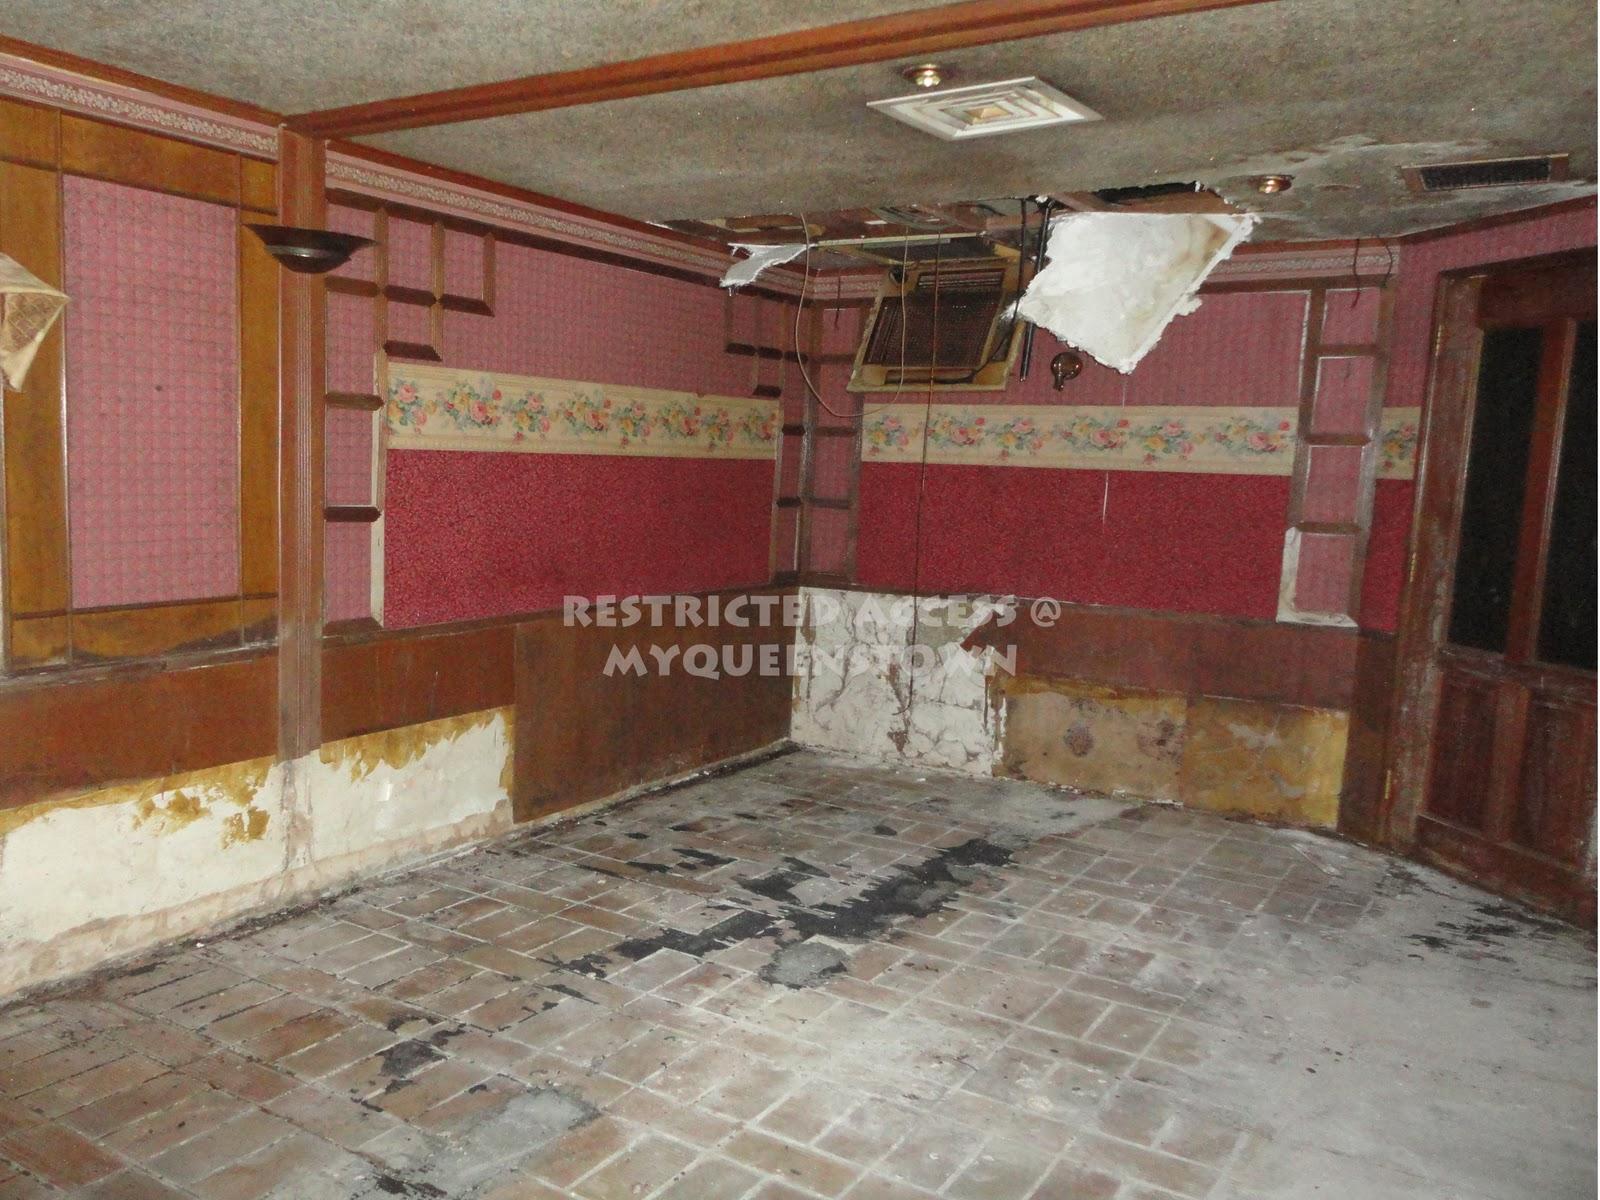 Xxx Restricted Access Myqueenstown 2 Palace Ktv My